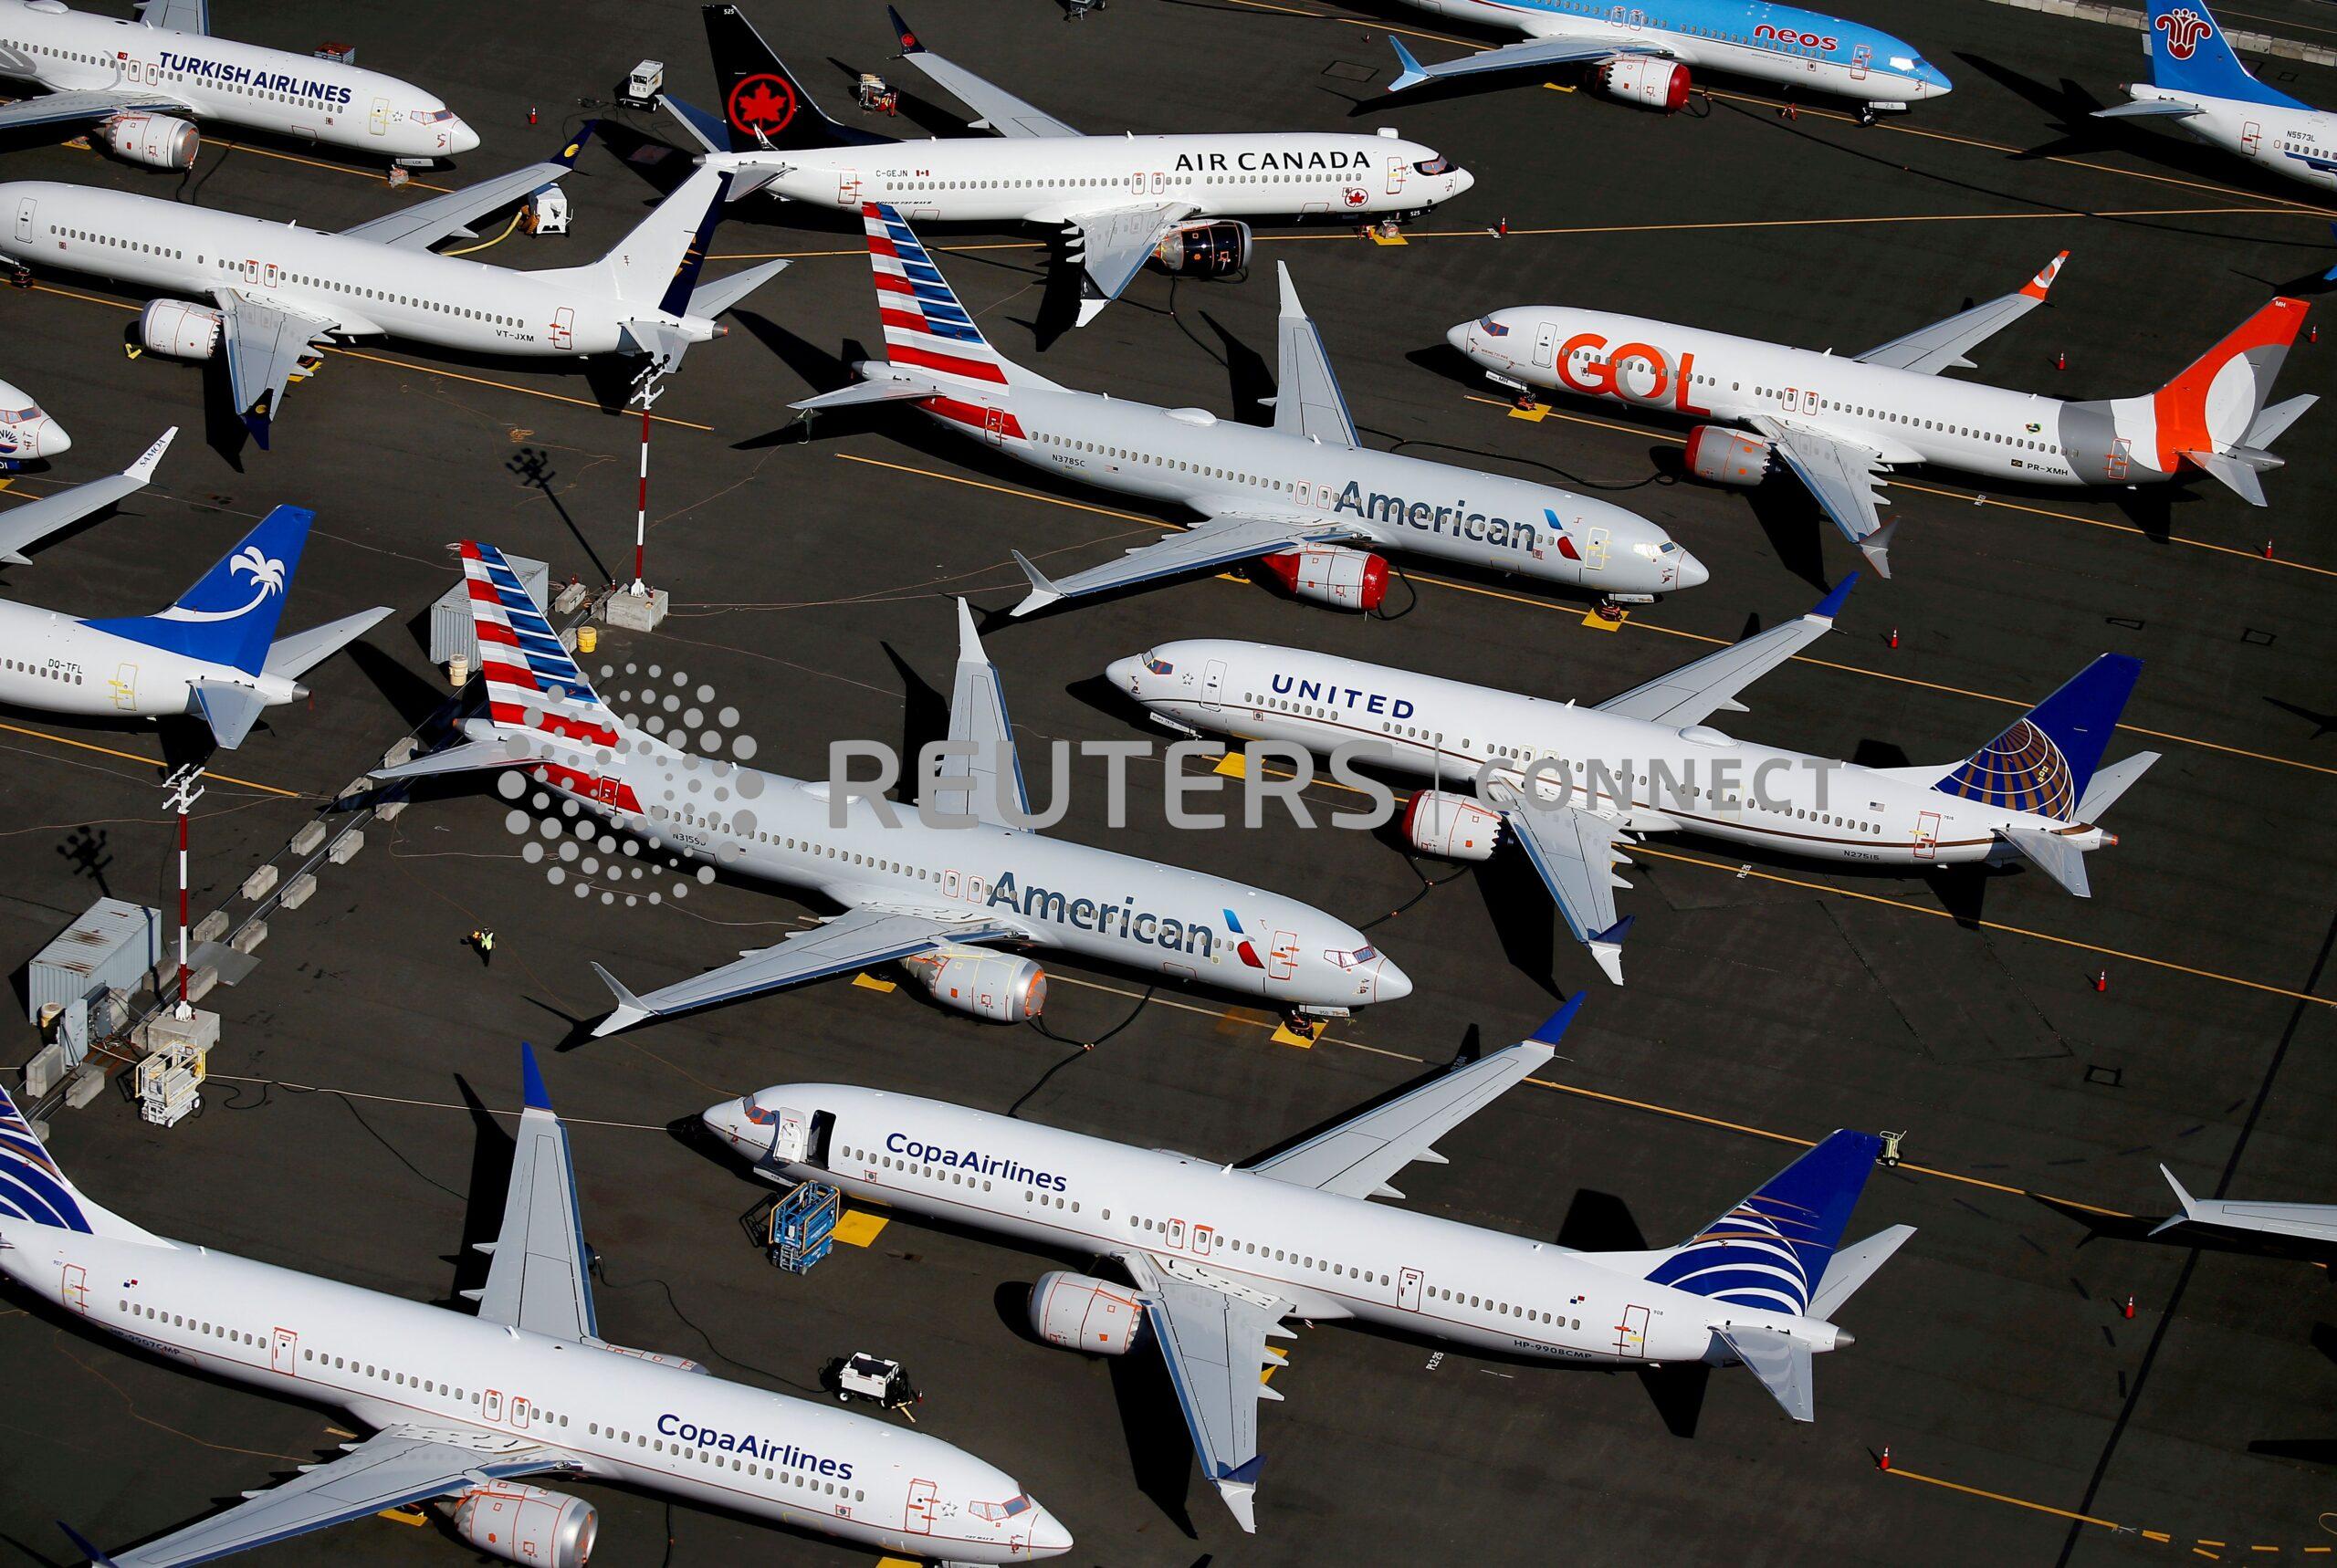 Analysis-Debate over pulling fuses widens regulatory cracks on 737 MAX